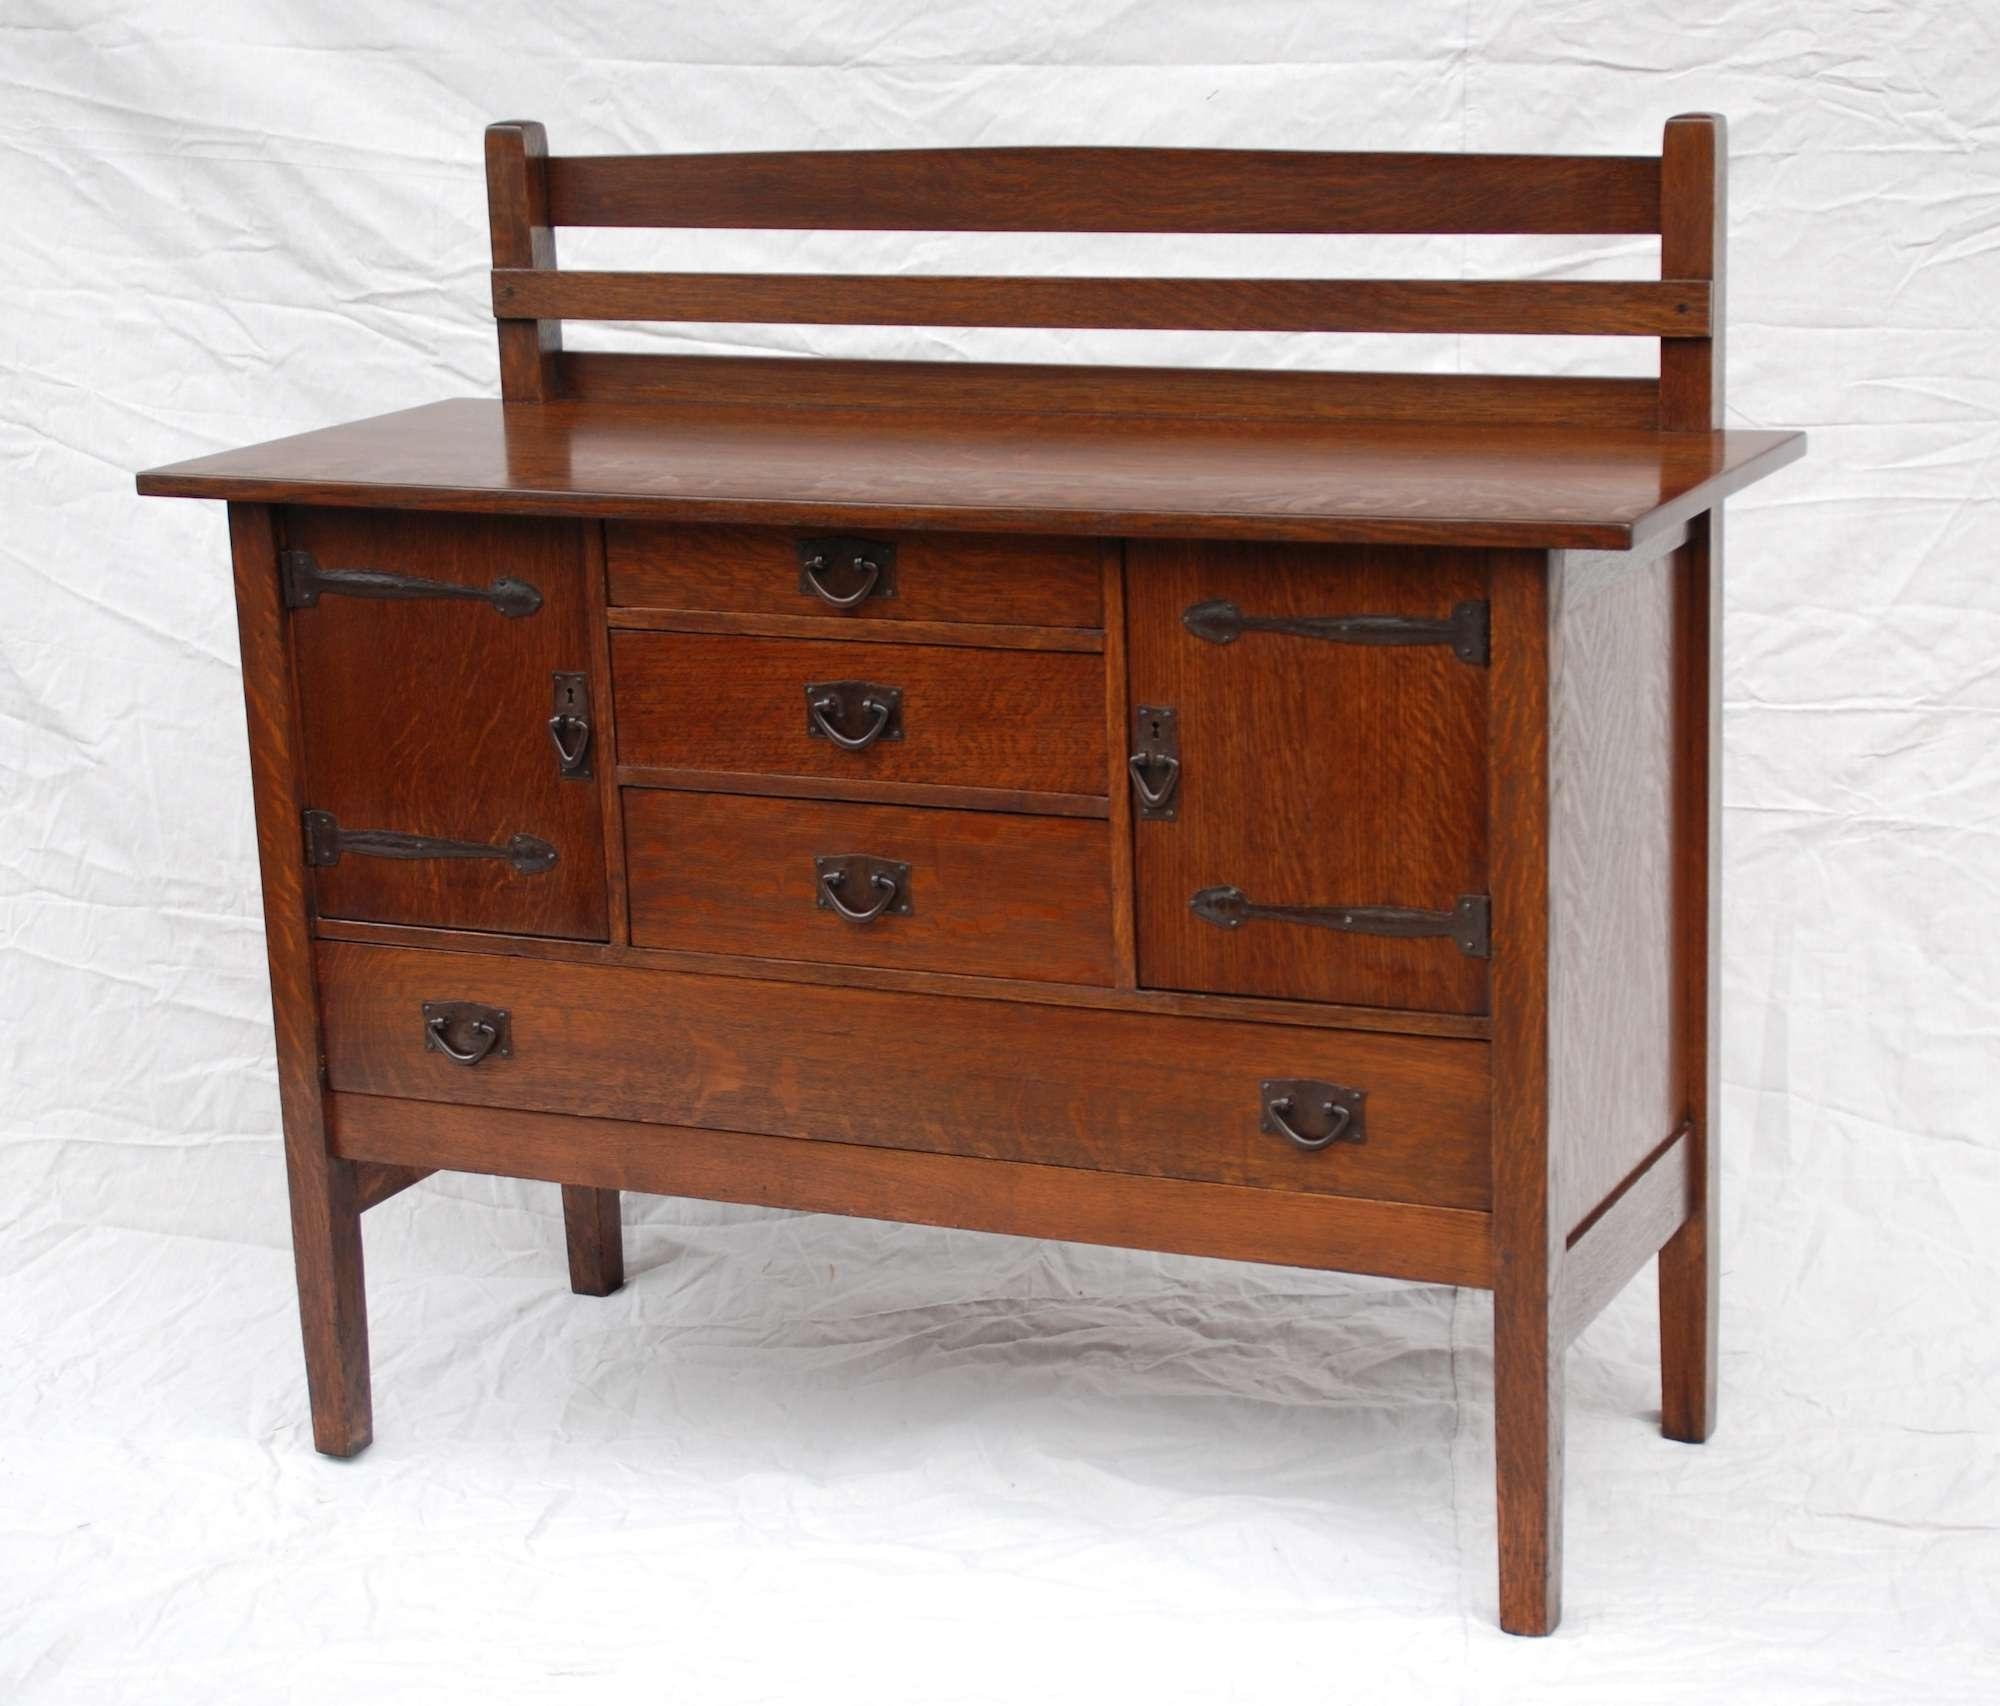 Voorhees Craftsman Mission Oak Furniture – Gustav Stickley Strap Regarding Stickley Sideboards (Gallery 2 of 20)